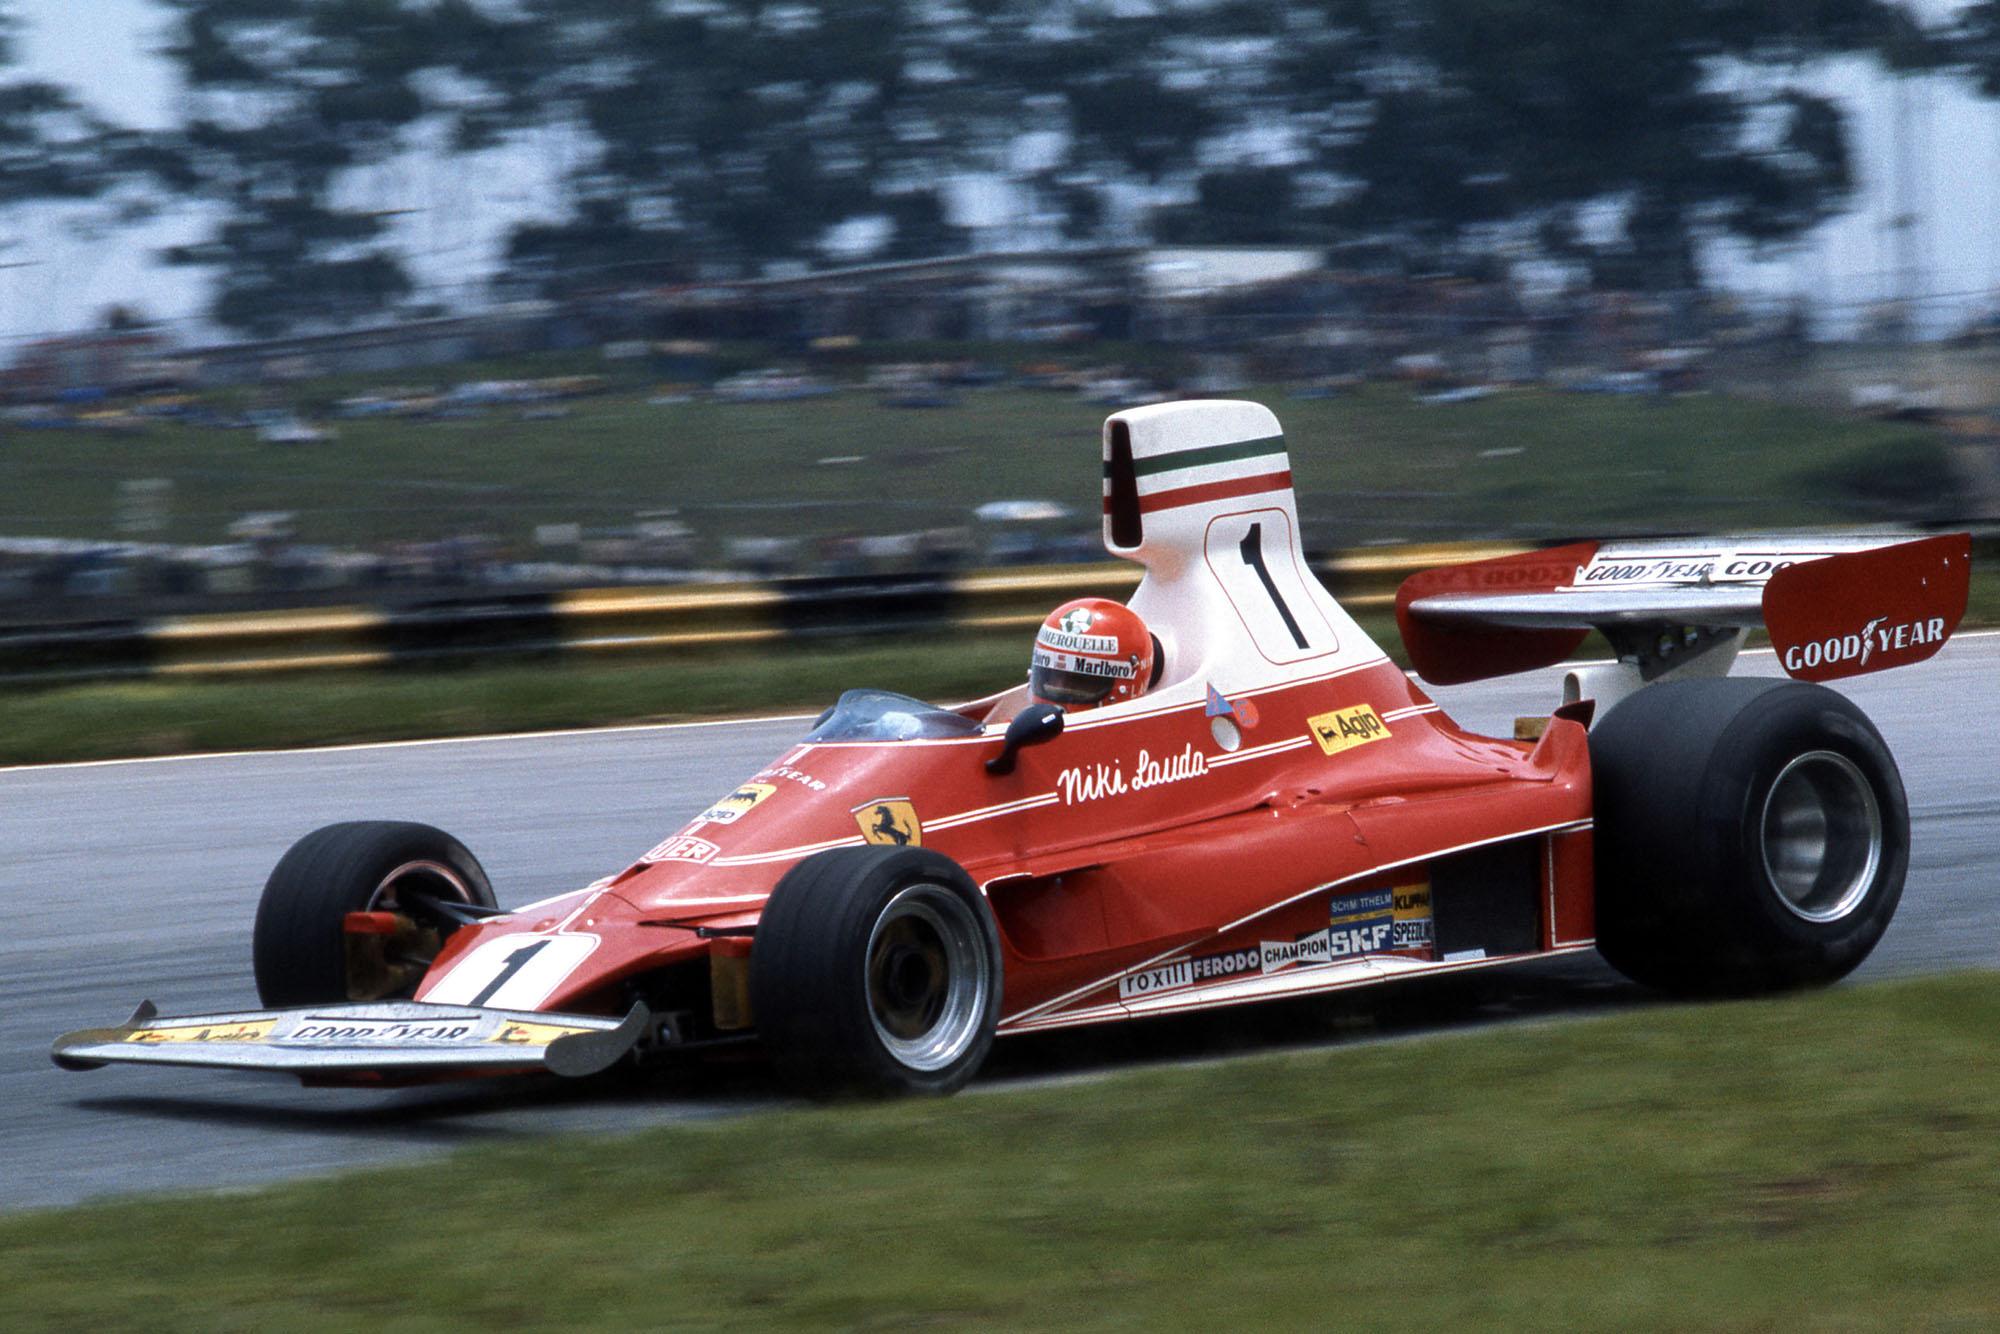 Niki Lauda (Ferrari) driving at the 1976 Brazilian Grand Prix